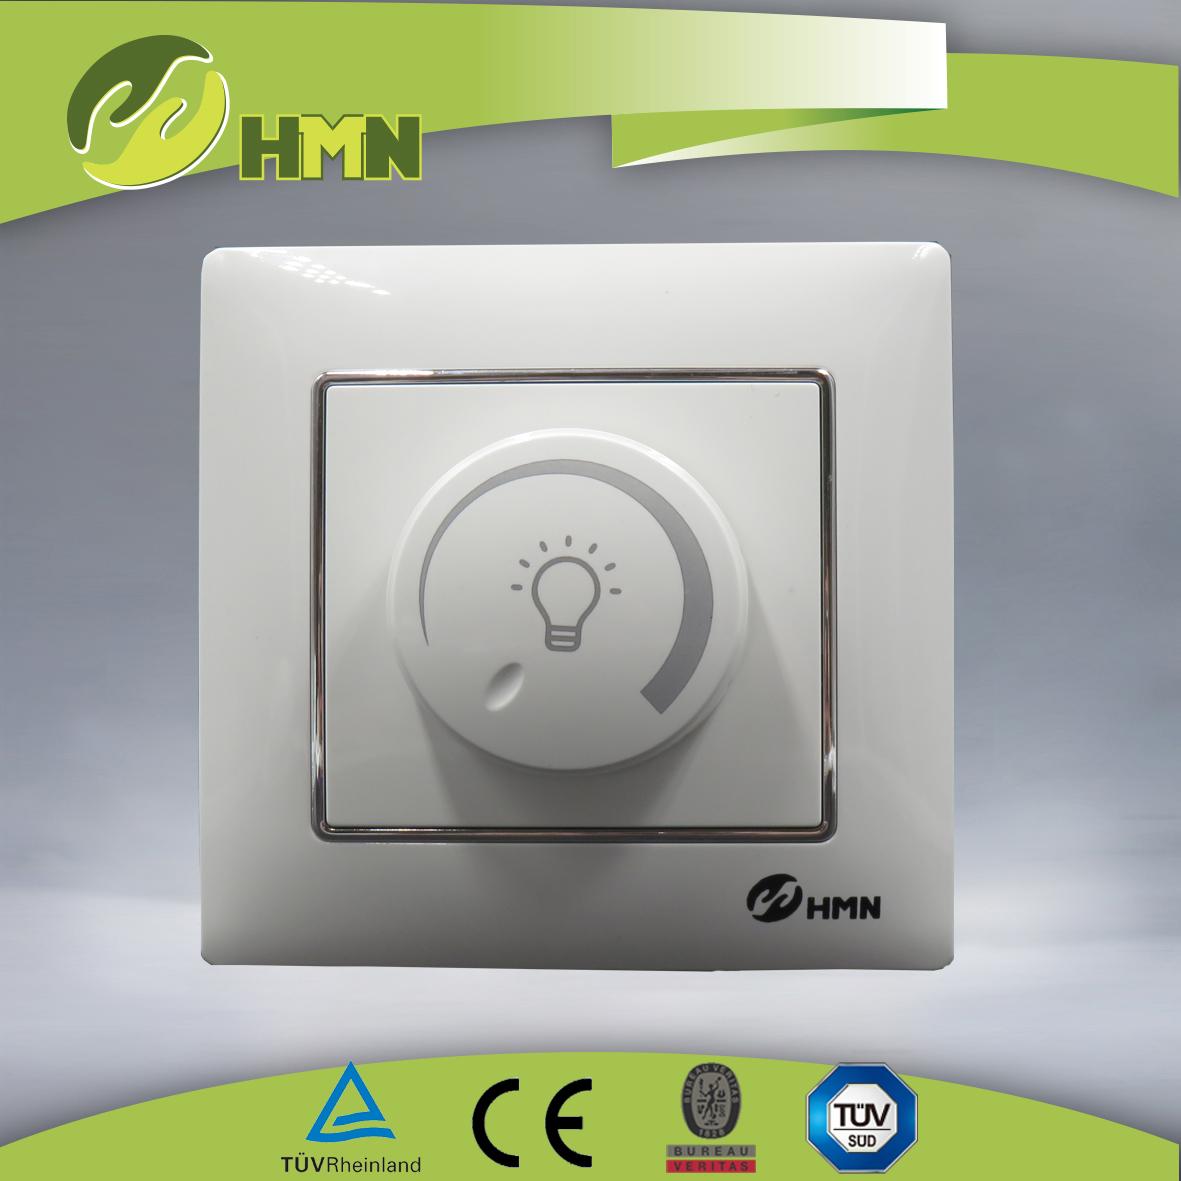 VC199 LED dimmer 200W